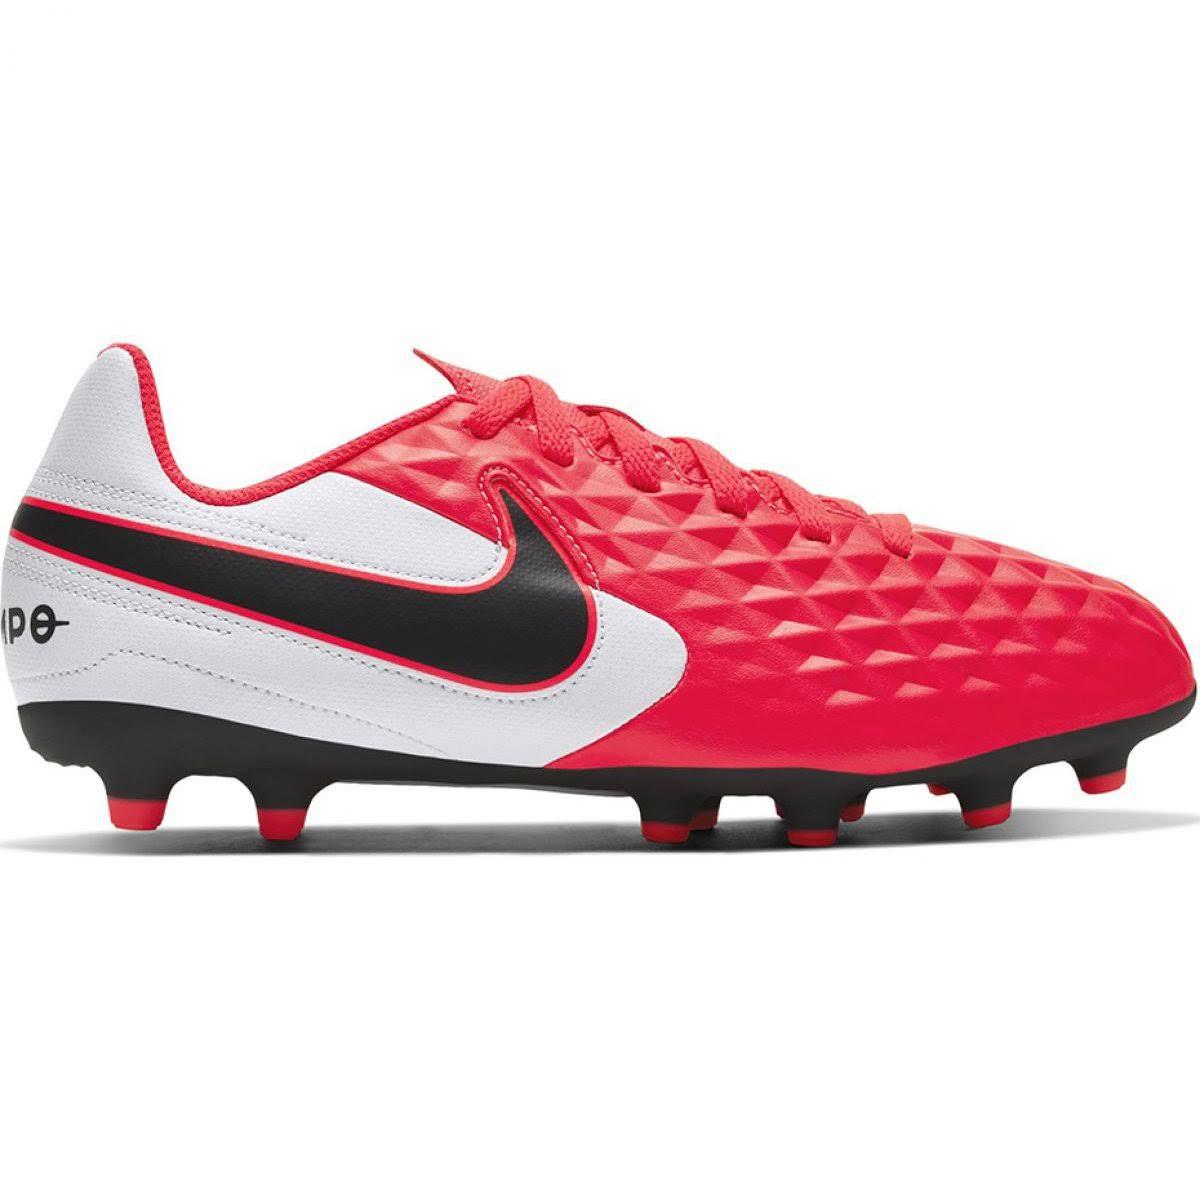 (5) Nike Tiempo Legend 8 Club FG/MG JR AT5881-606 Kids Red Football Trainers